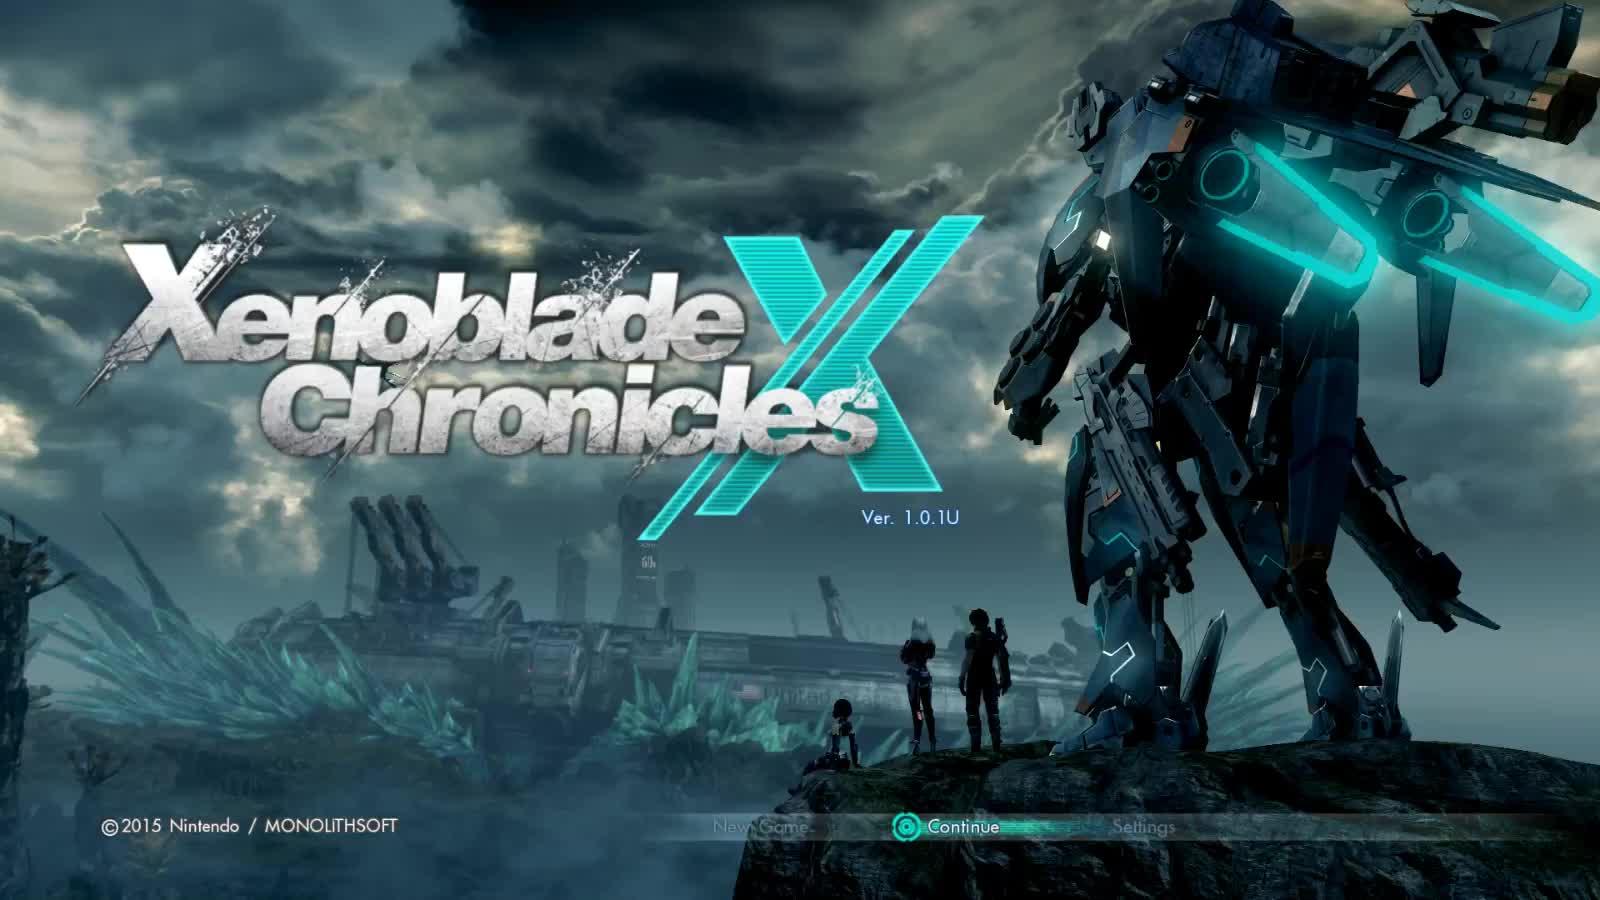 Cemu WiiU, Main Menu, Xenoblade Chronicles X, Xenoblade Chronicles X Main Menu GIFs